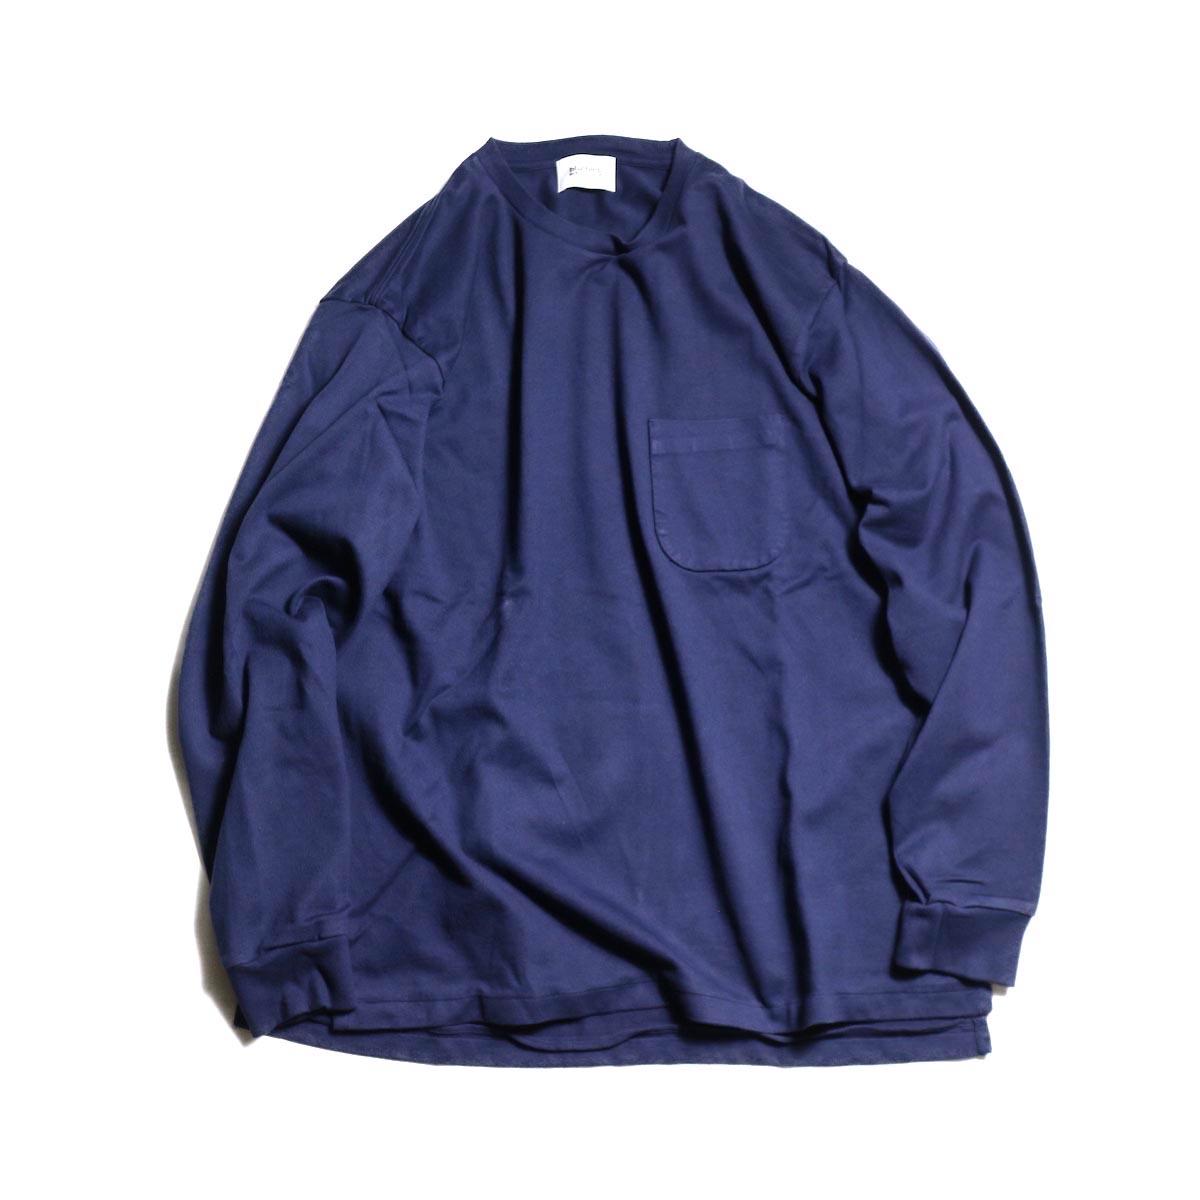 blurhms / Middle-Weight & Super Soft Pocket L/S -Navy